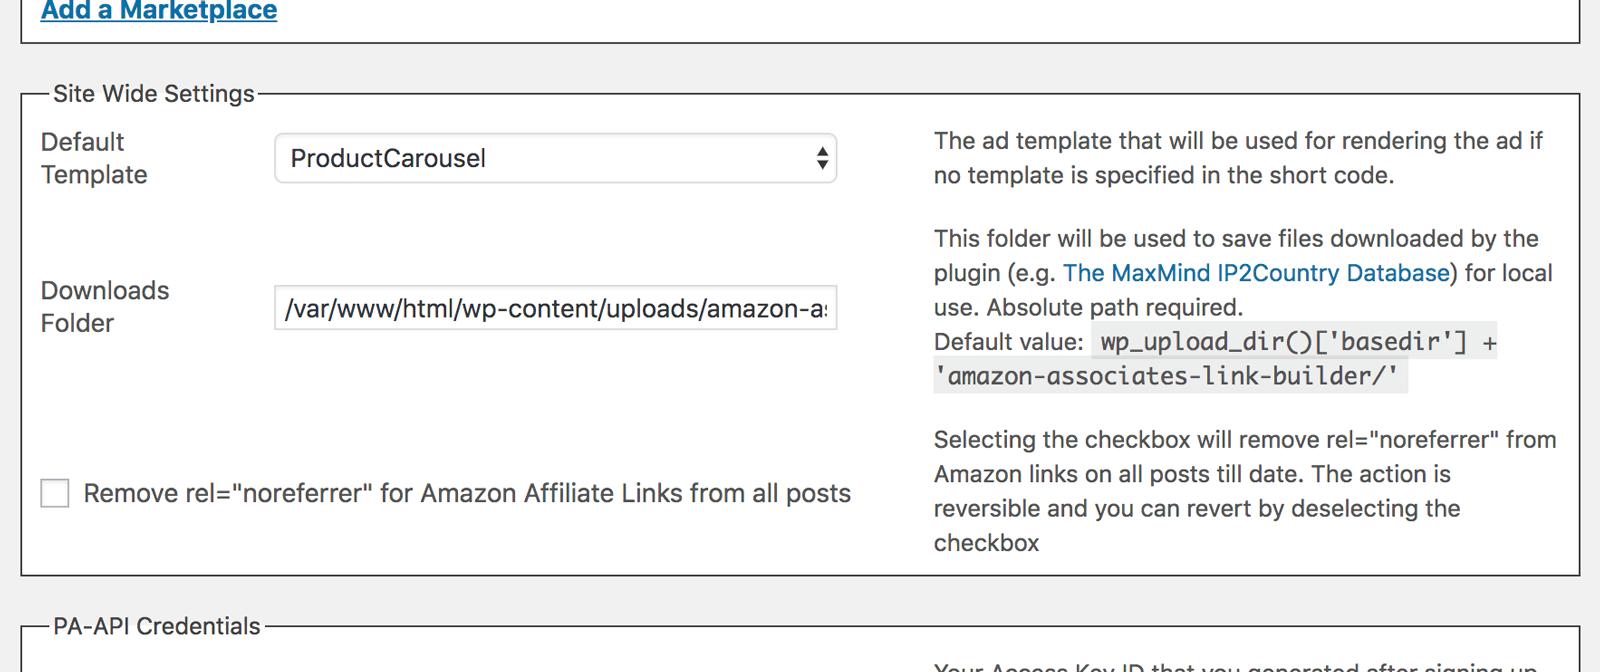 Amazon Associates Link Builderテンプレートなどの選択